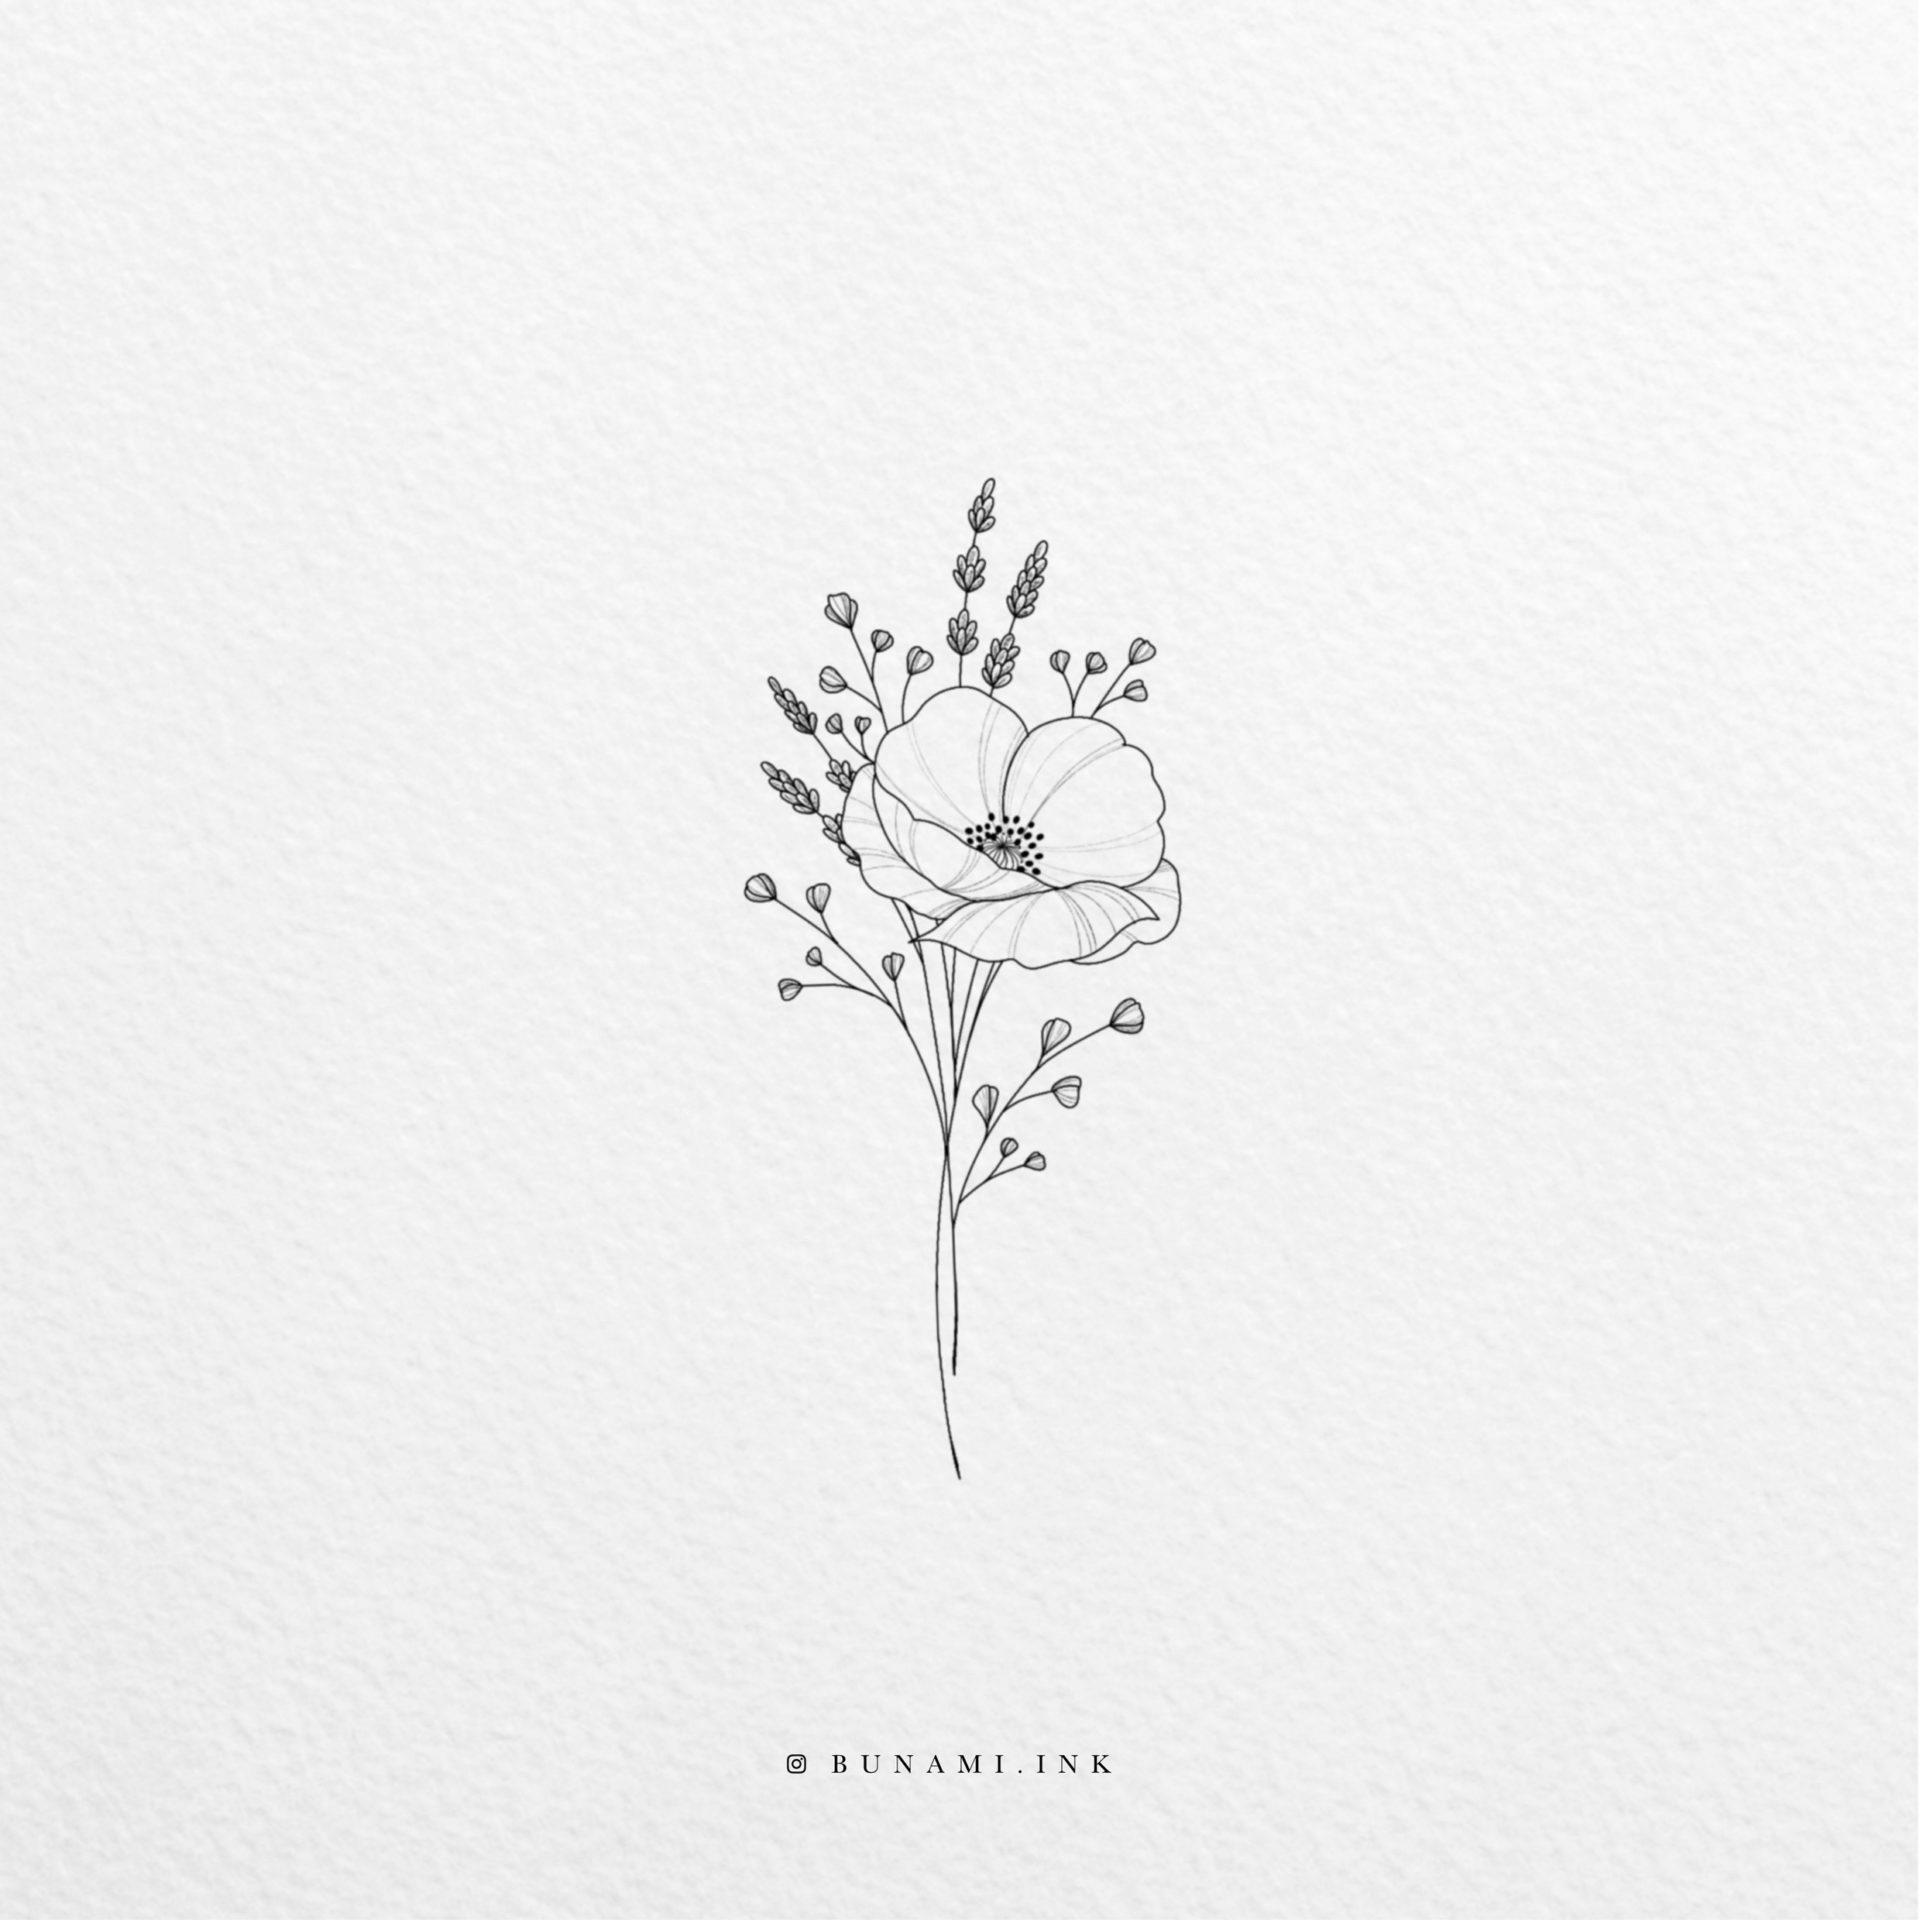 wild-poppy-and-lavender-bouquet_2020-08-01